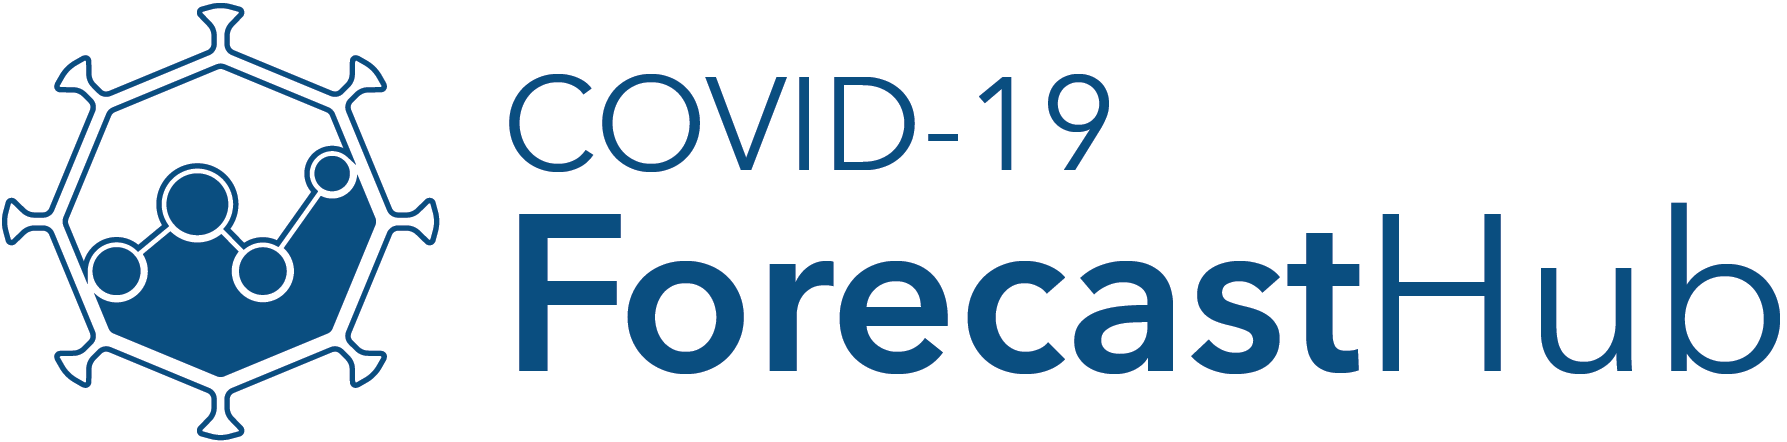 Viz - COVID-19 Forecast Hub